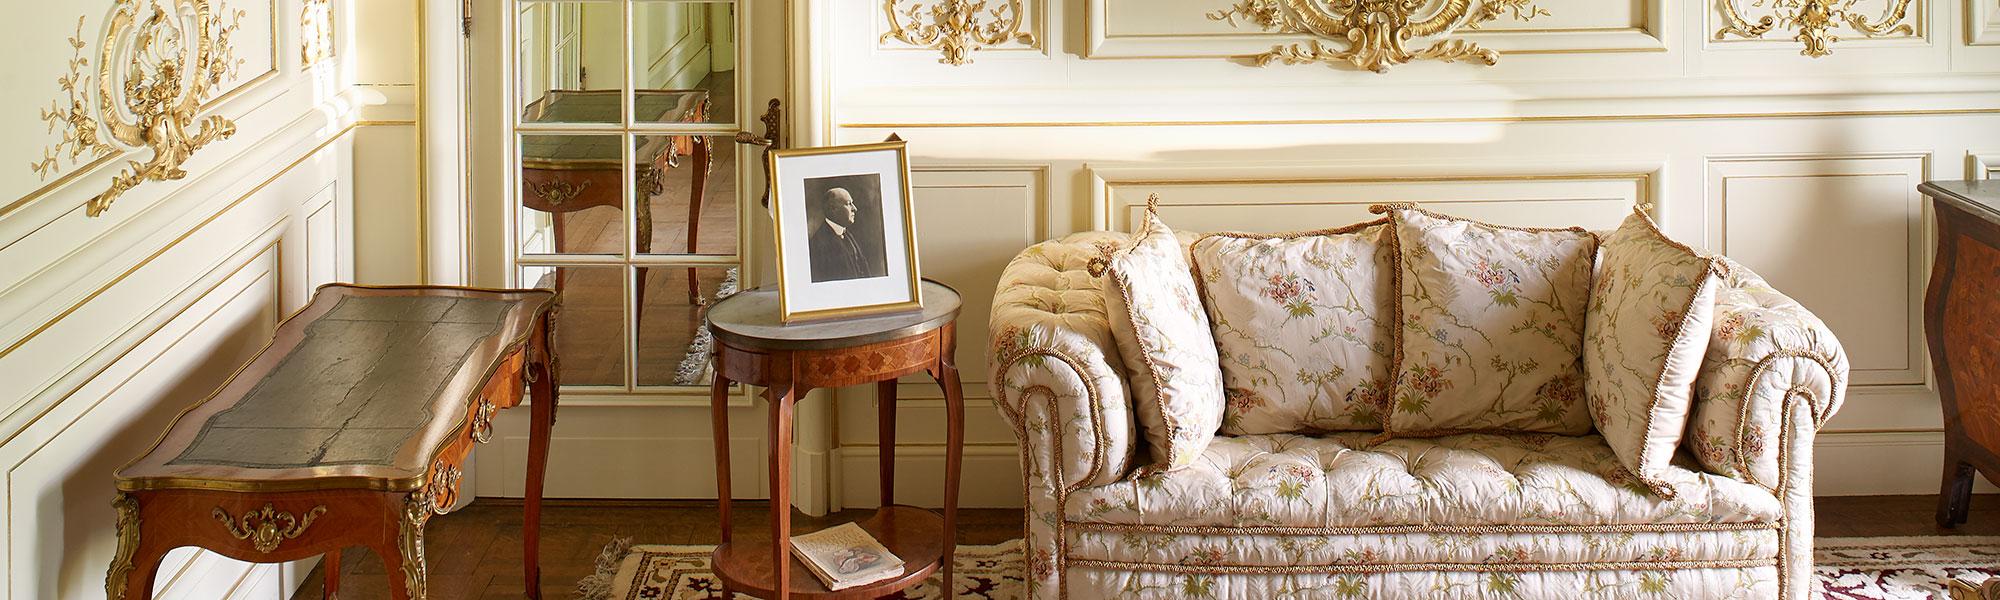 decorative header image